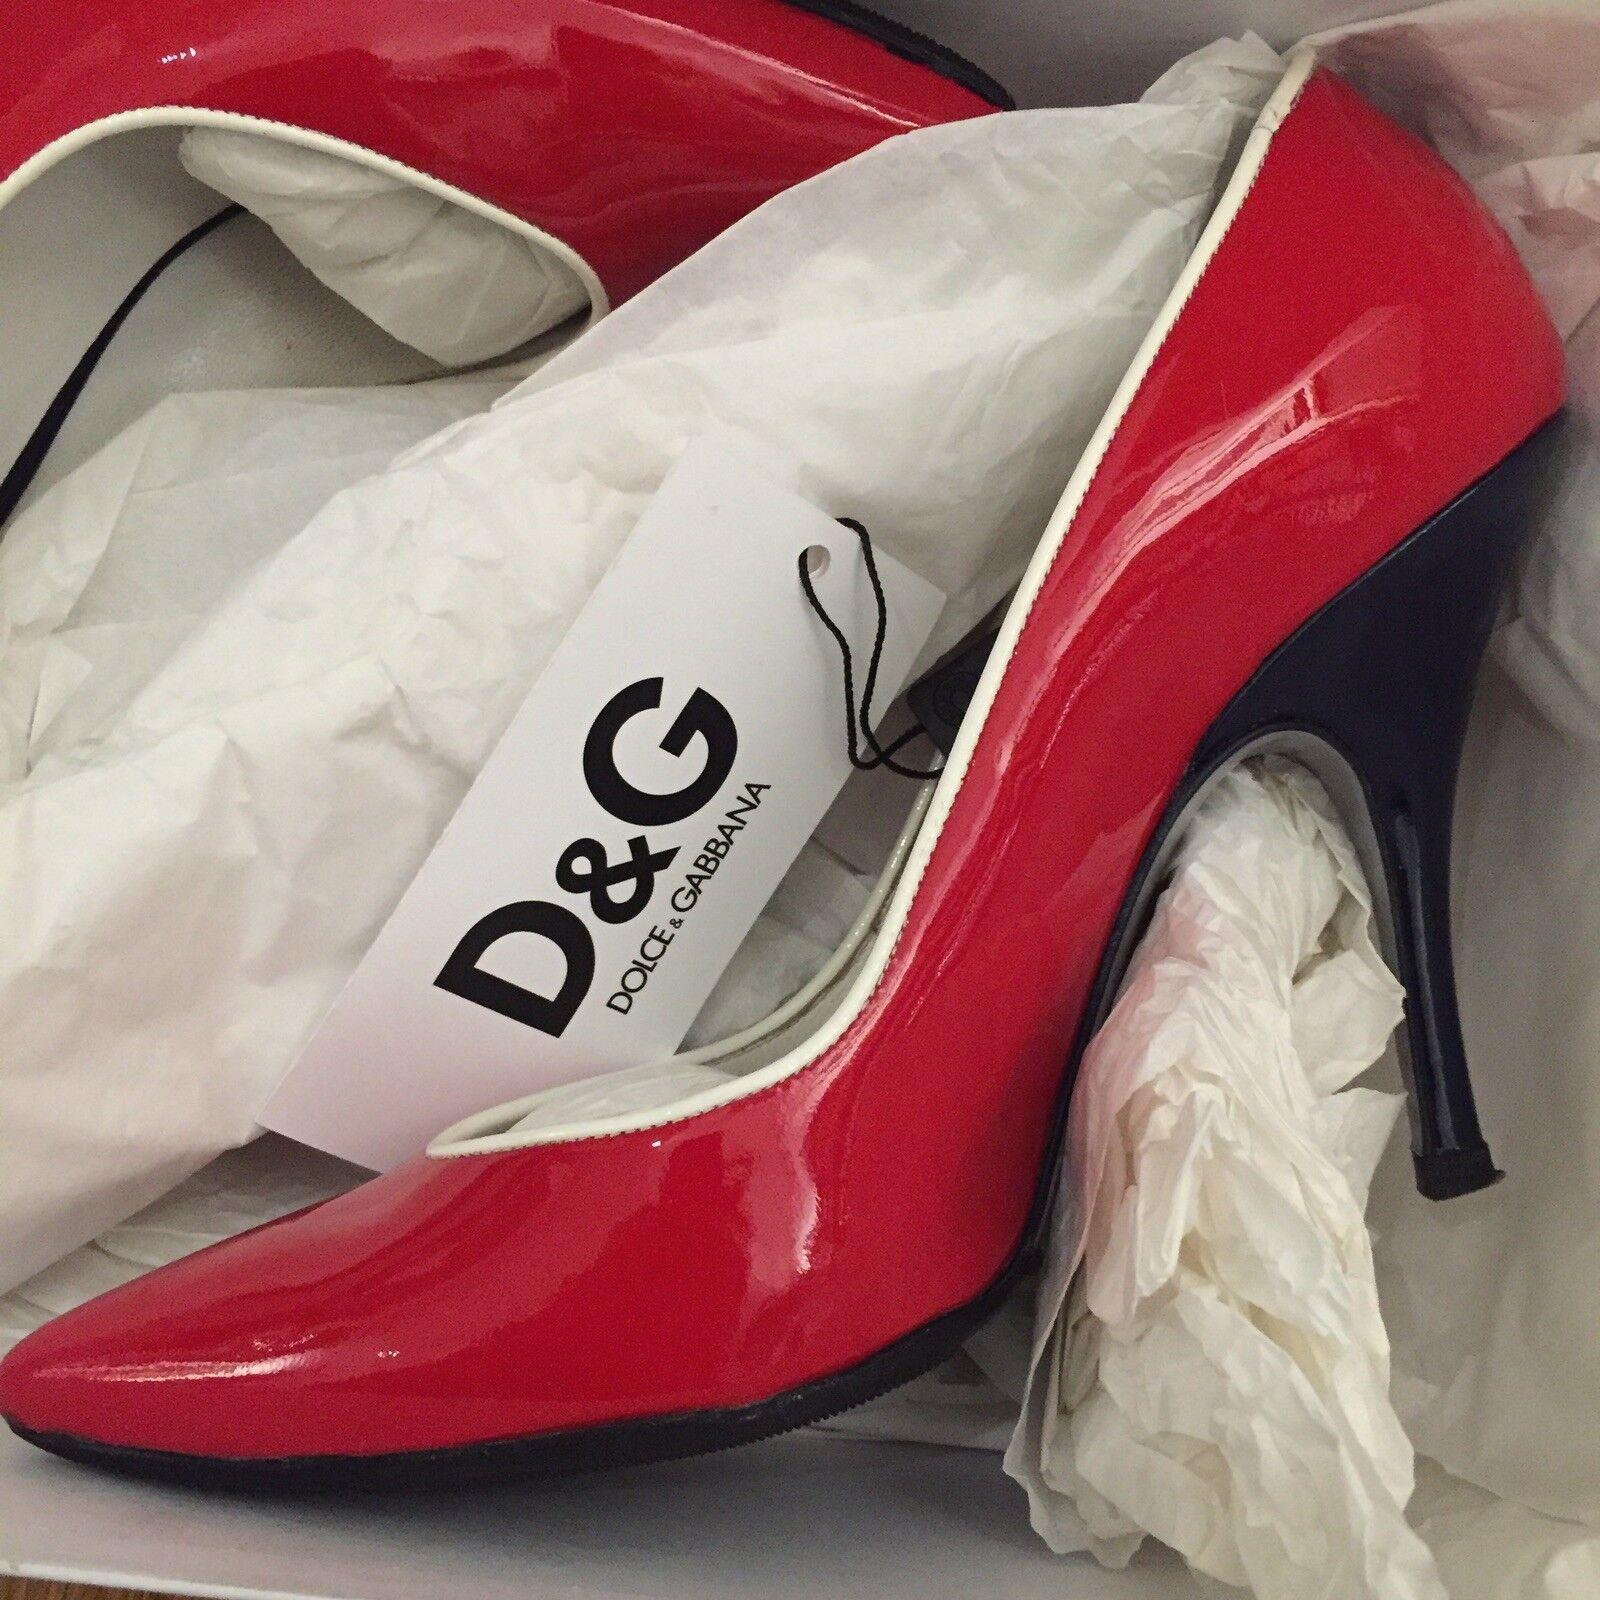 D&G Candy rot Heel Größe 38